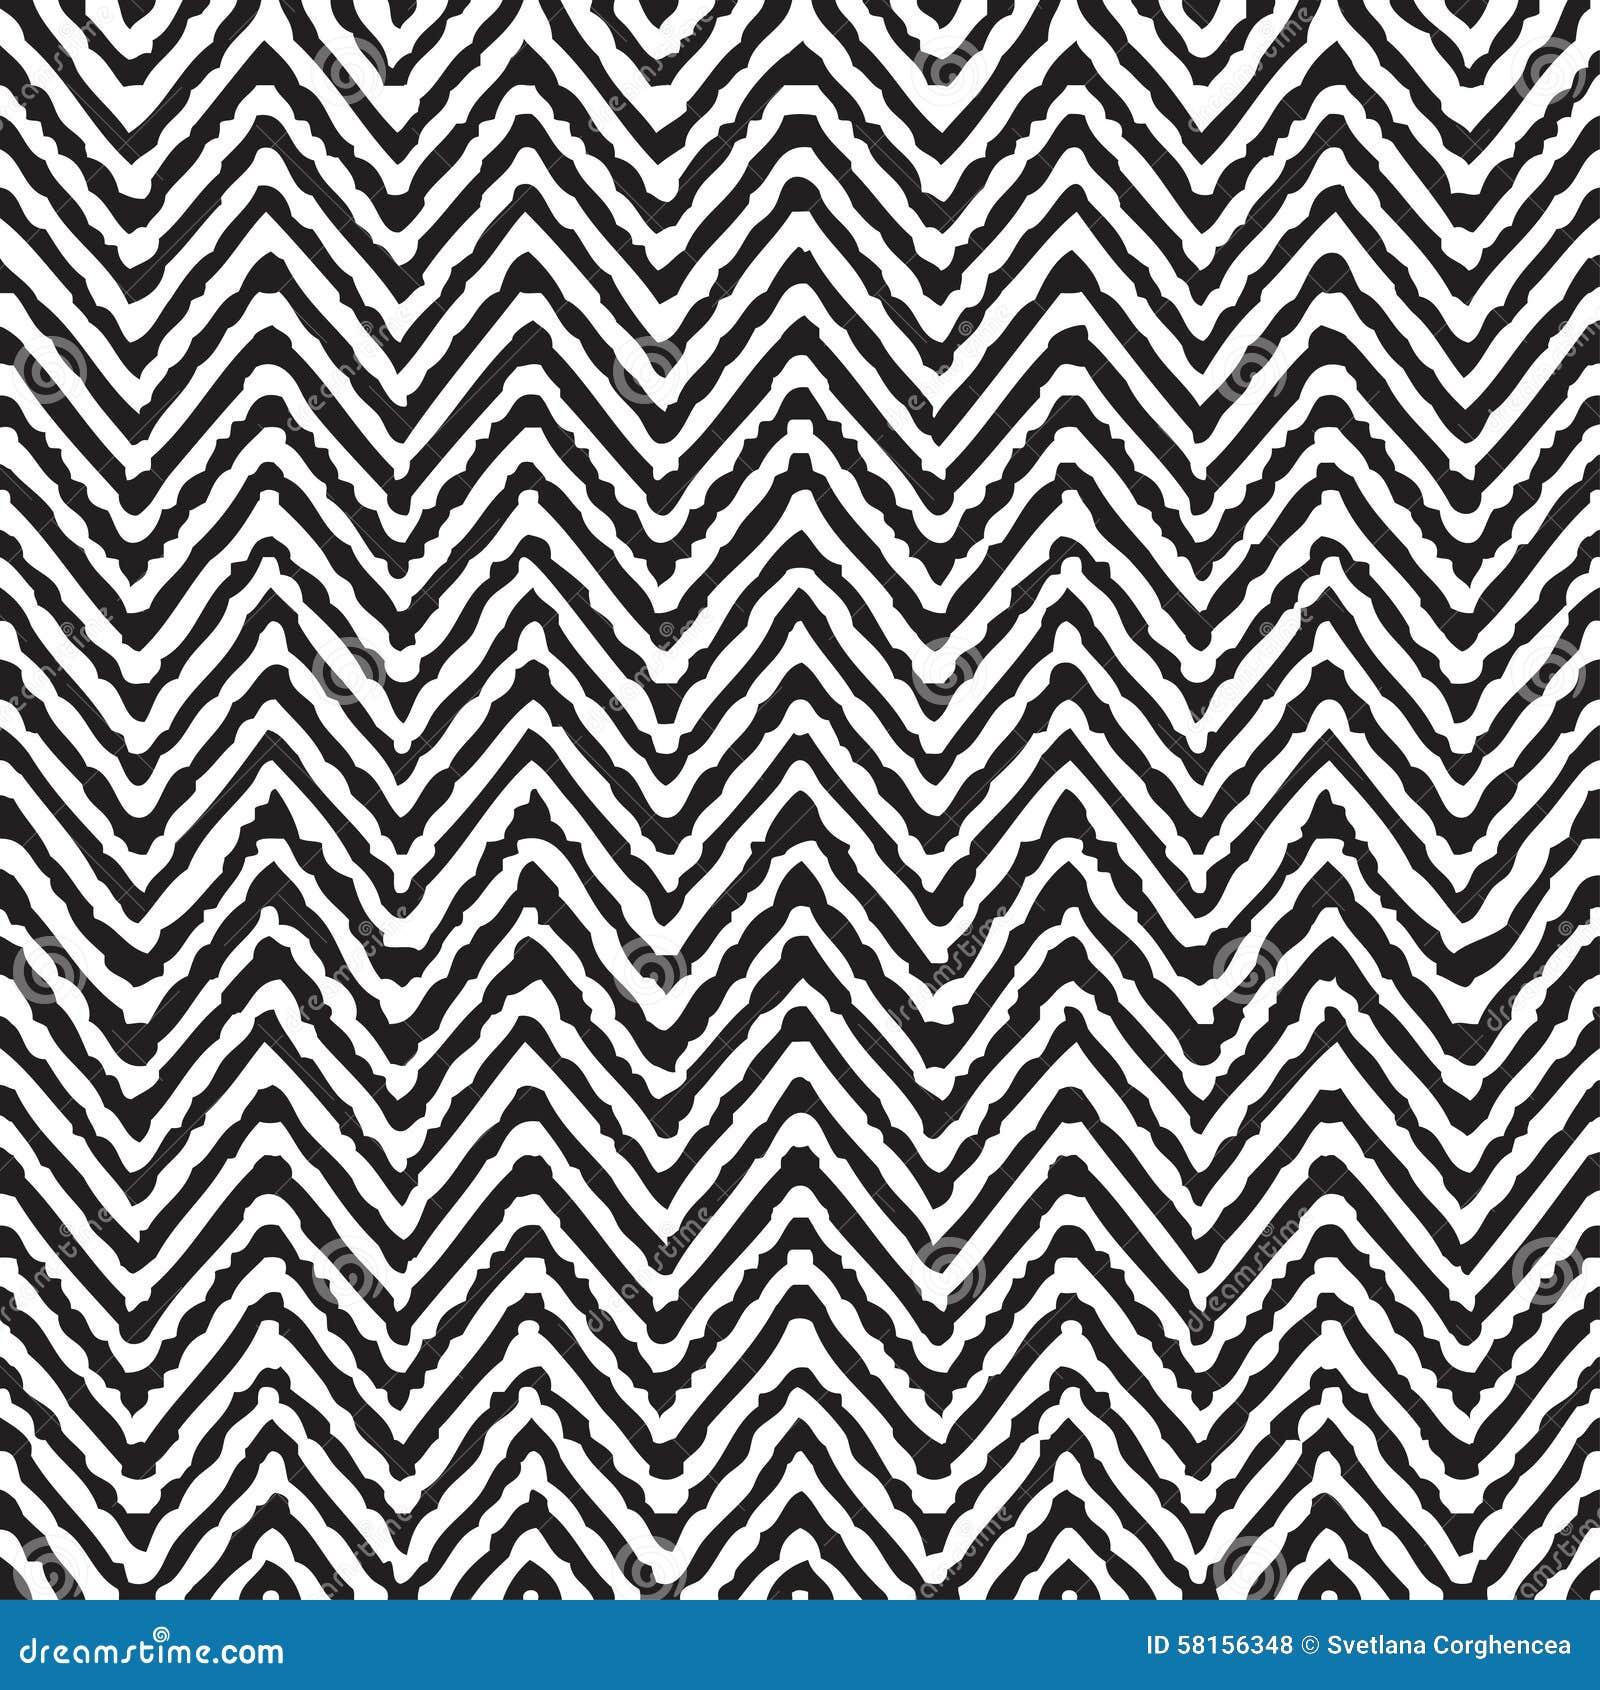 Hand Drawing Zigzag Geometrical Ethnic Pattern Seamless